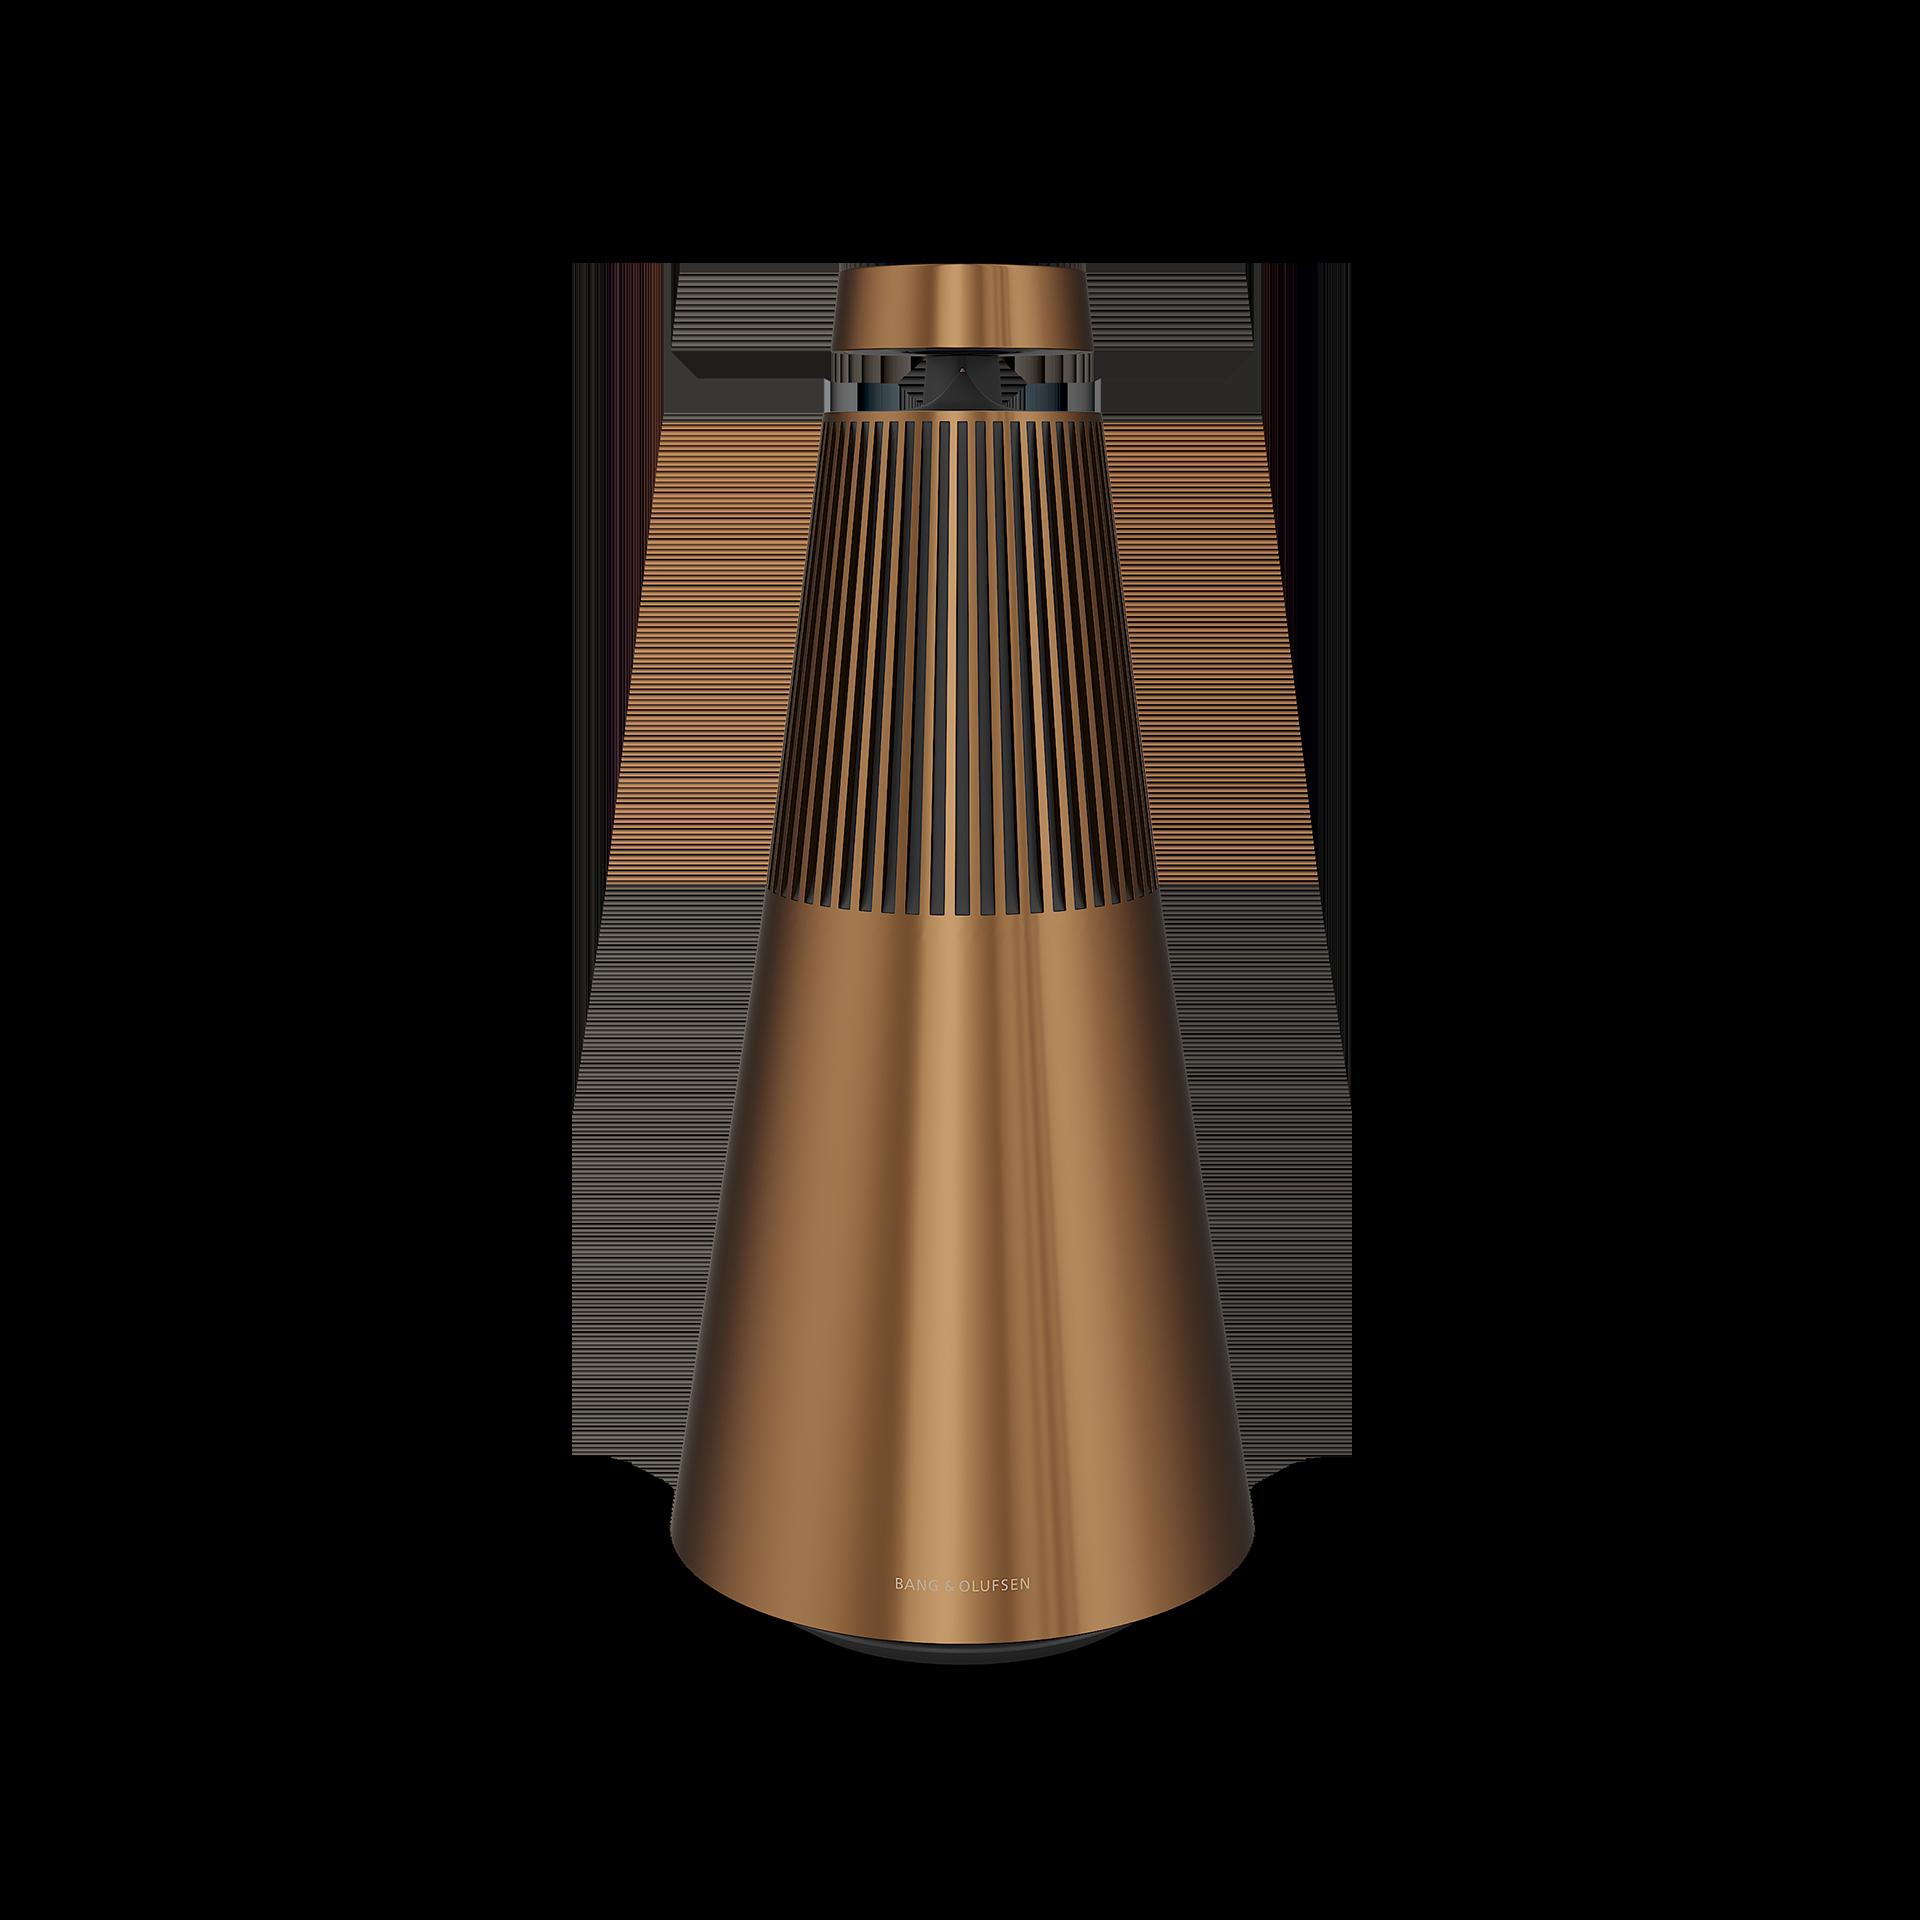 Beosound 2 Connected Speakers Lautsprecher B O